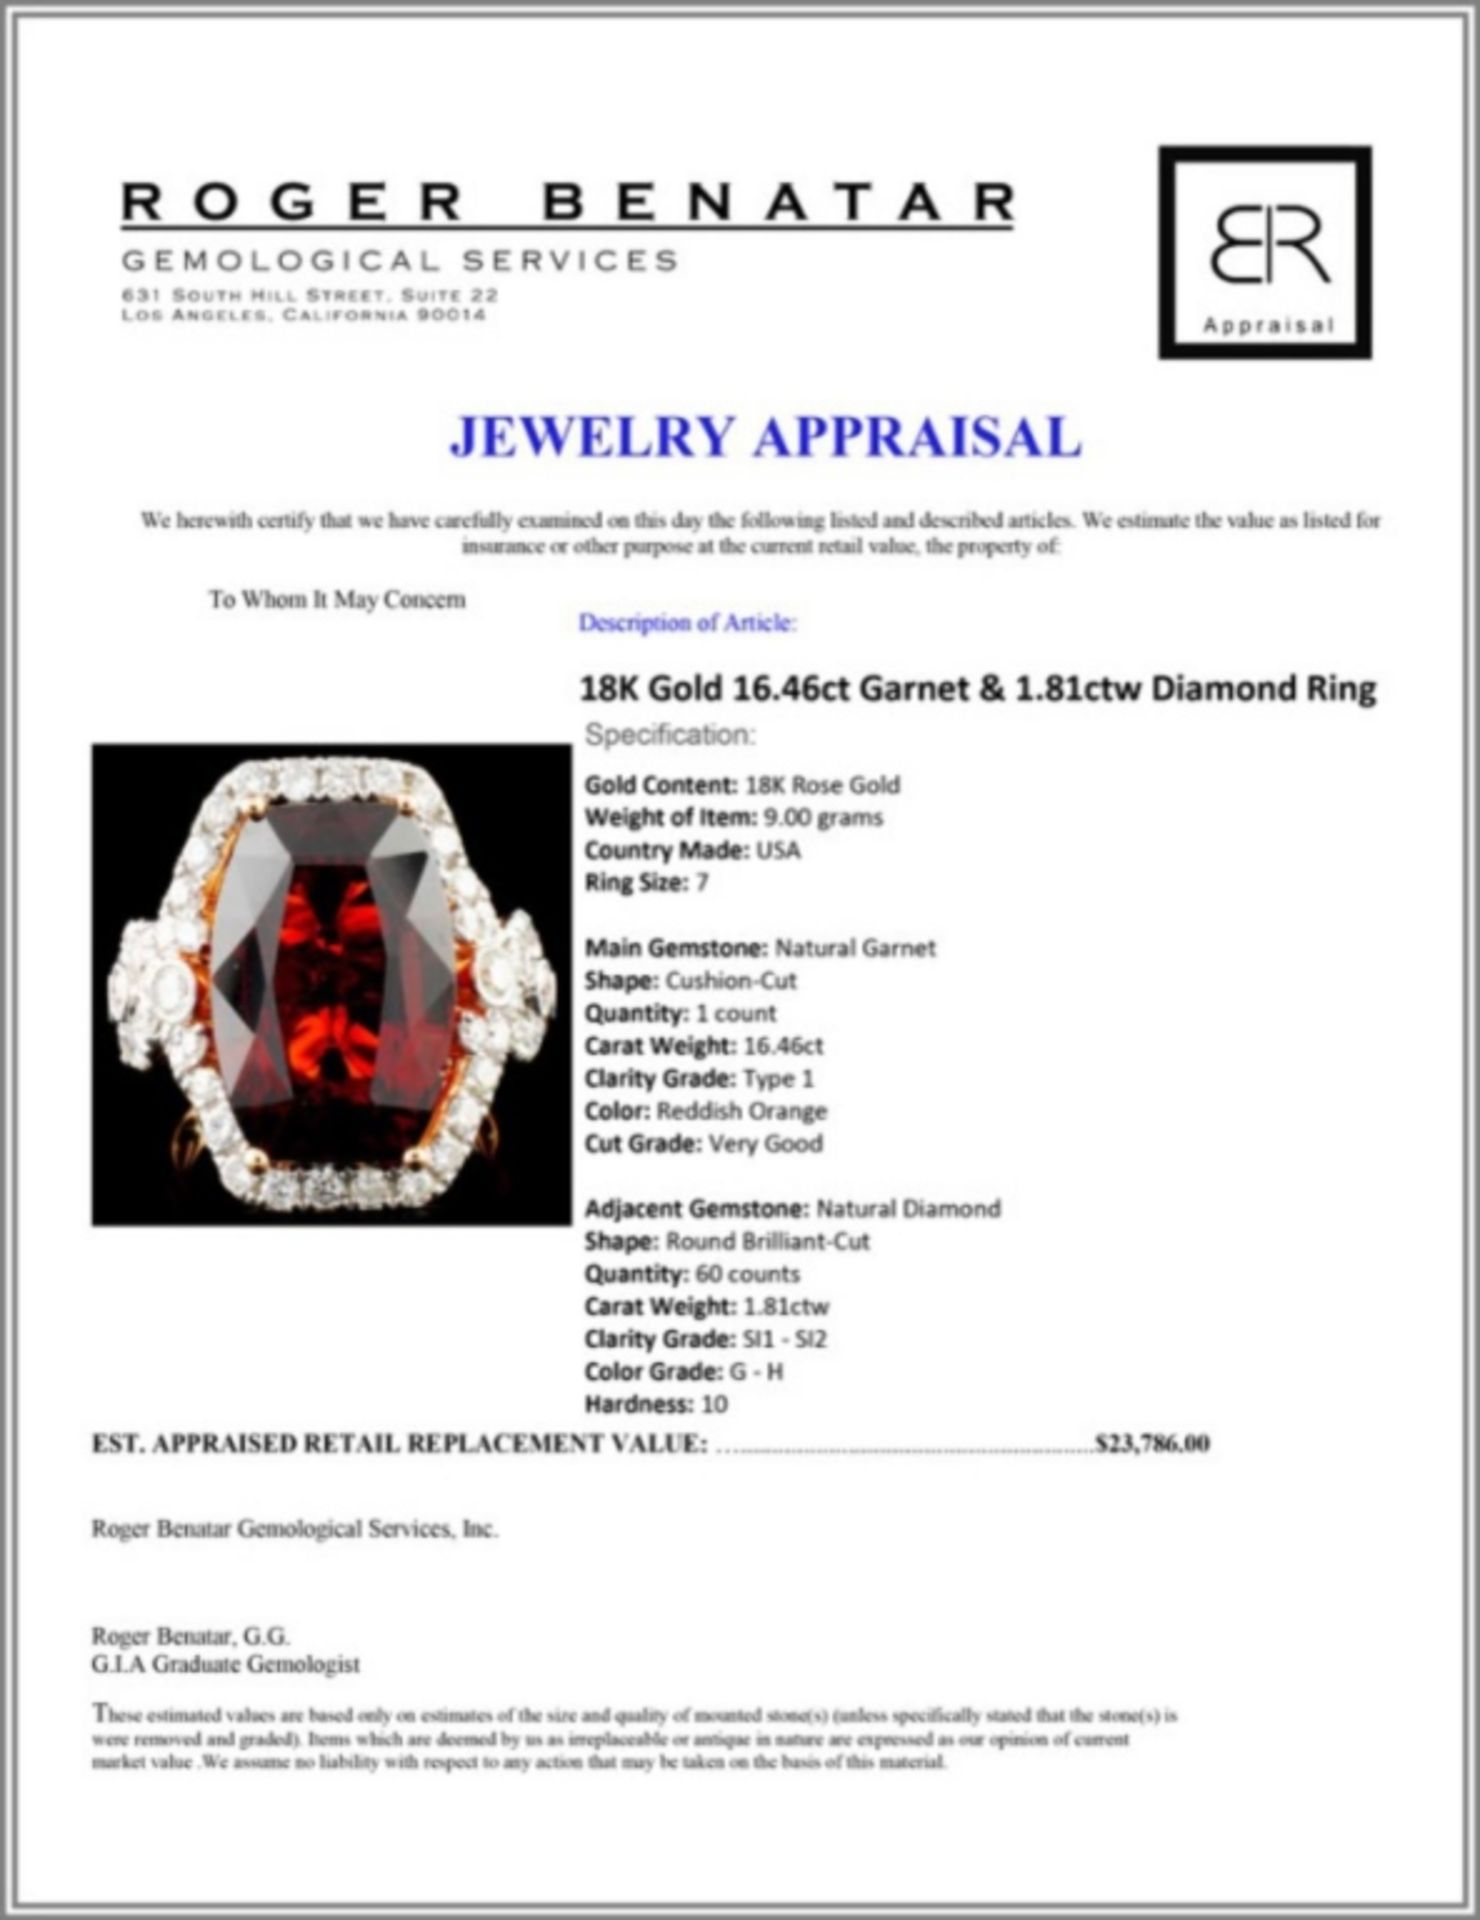 18K Gold 16.46ct Garnet & 1.81ctw Diamond Ring - Image 5 of 5